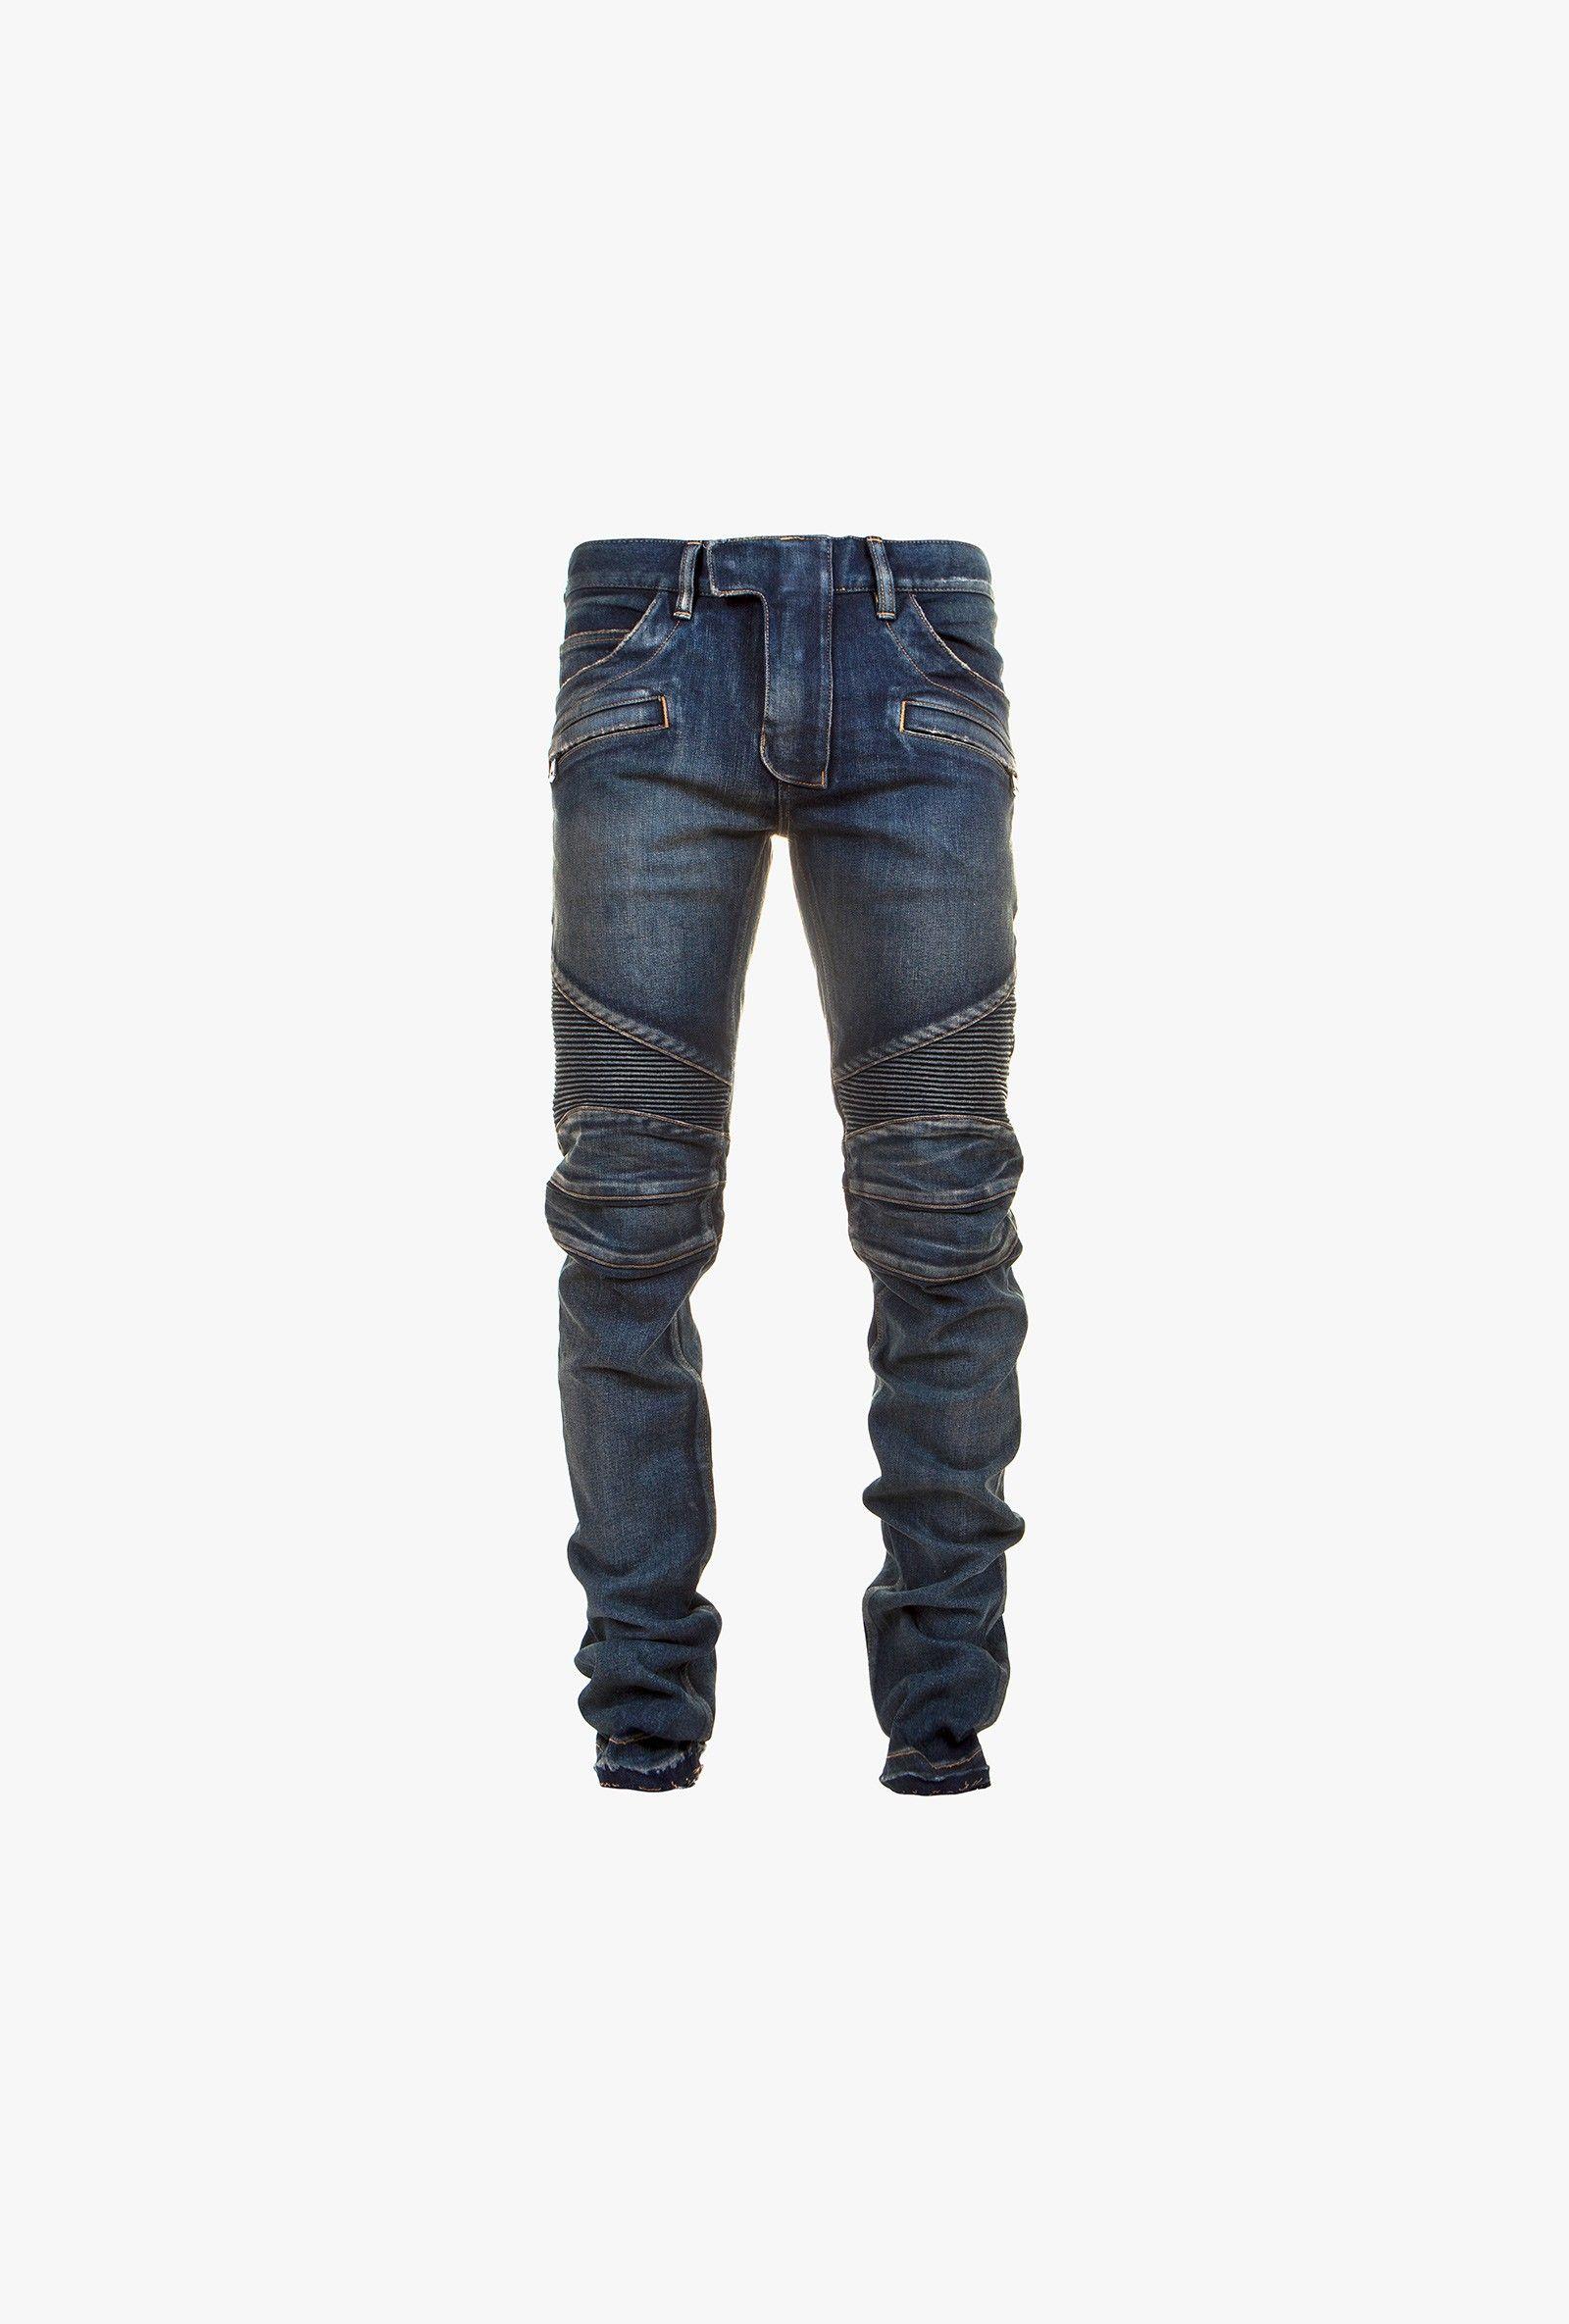 aea32588 Balmain - Regular-fit stretch cotton denim biker jeans - Mens biker jeans